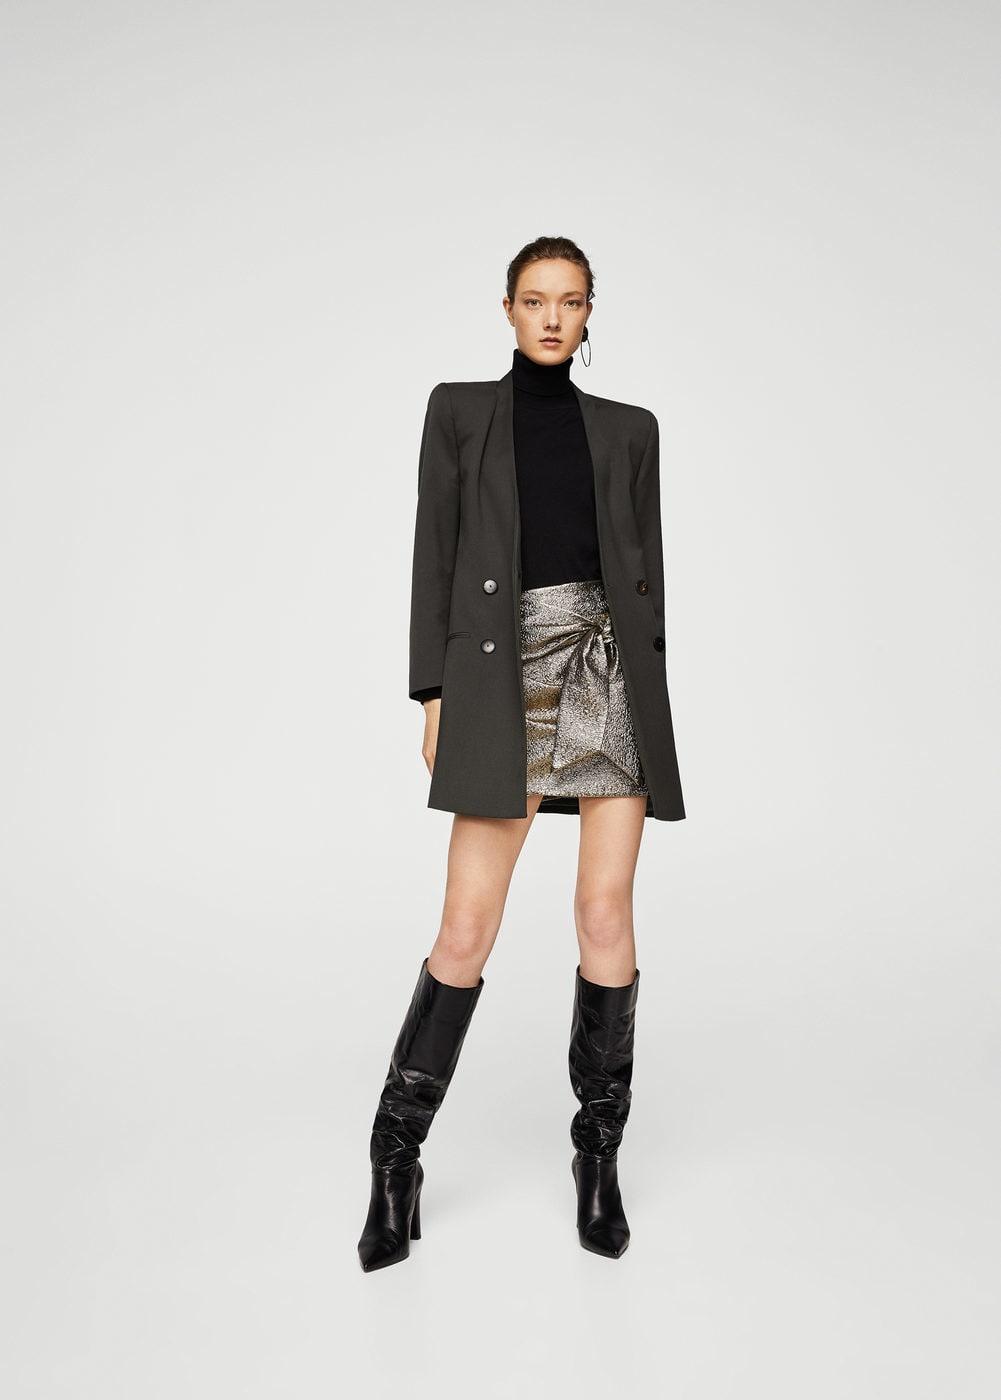 Mango Knot Metallic Skirt - £35.99